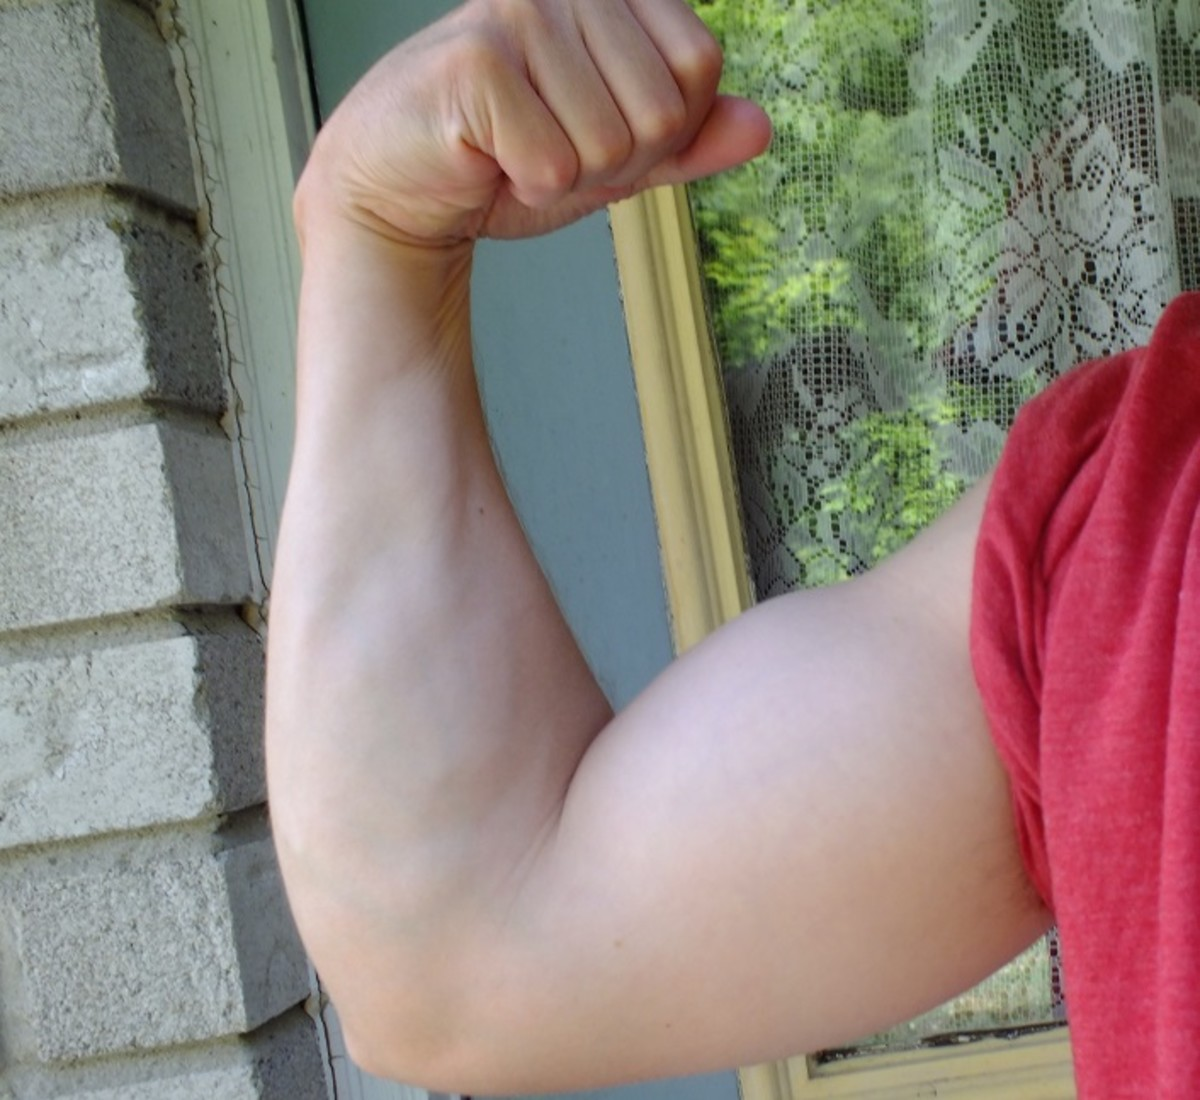 Bigger biceps from doing chin ups.